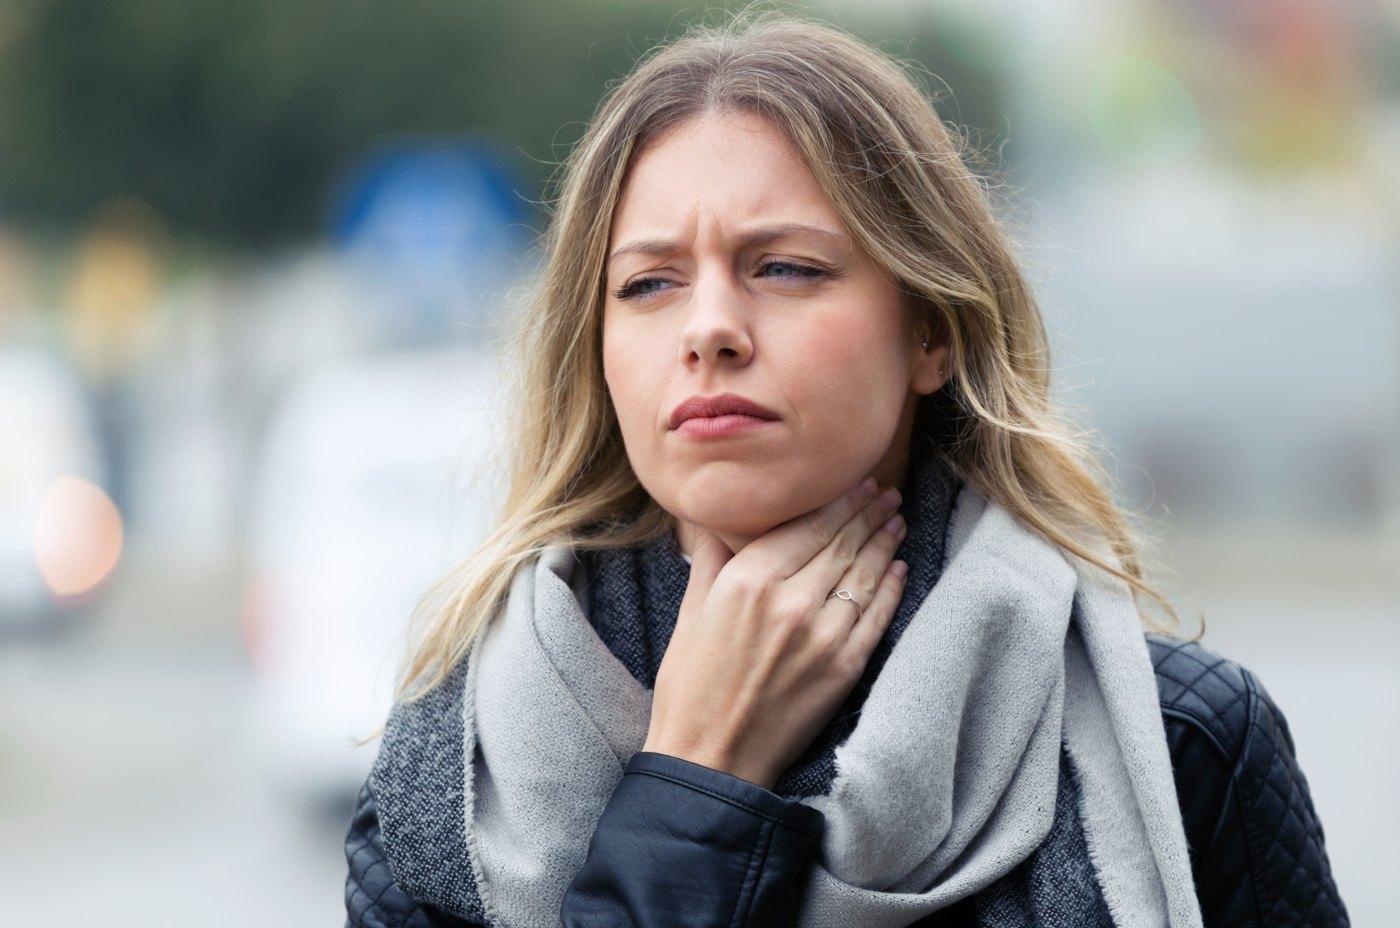 Mulher jovem com dor de garganta